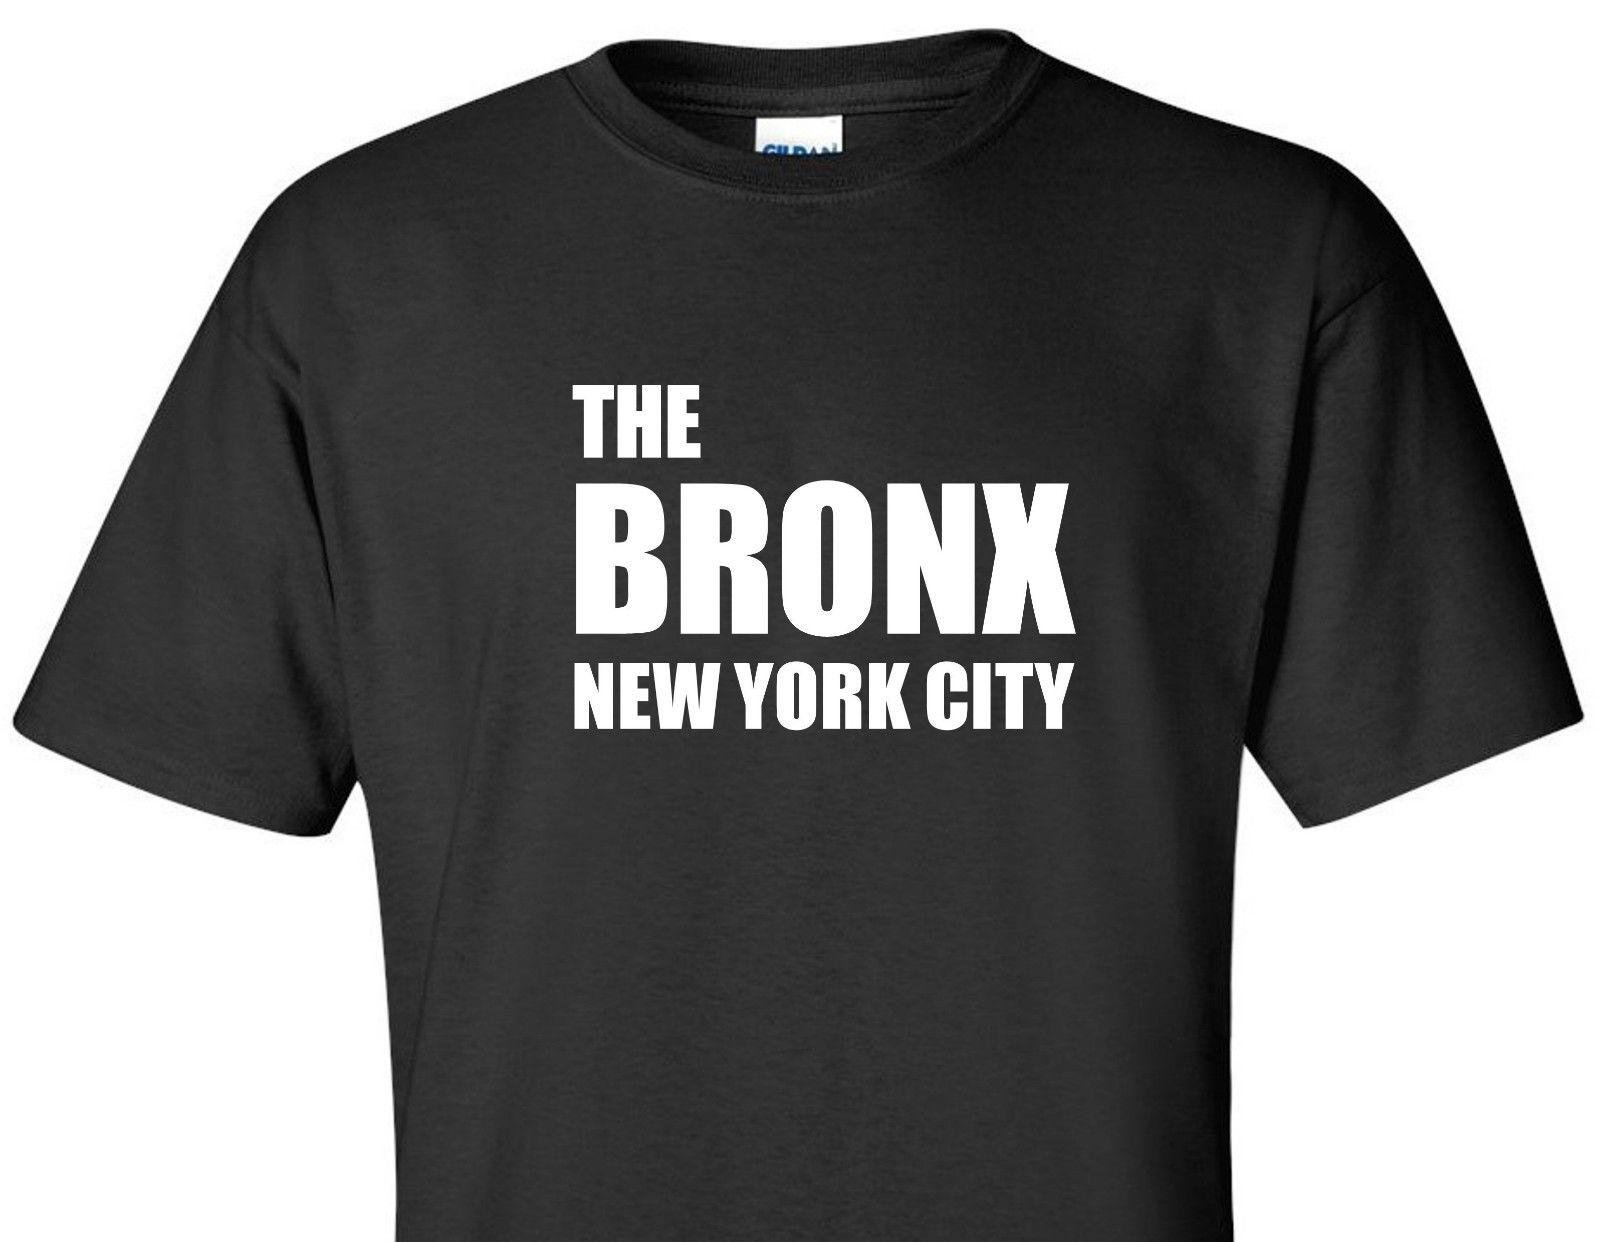 THE BRONX T SHIRT NEW YORK CITY NY NYC PRIDE URBAN SHORT SLEEVE TEE BLACK  SHIRT Funniest T Shirt Comical T Shirts From Idesignz bd1b820868c